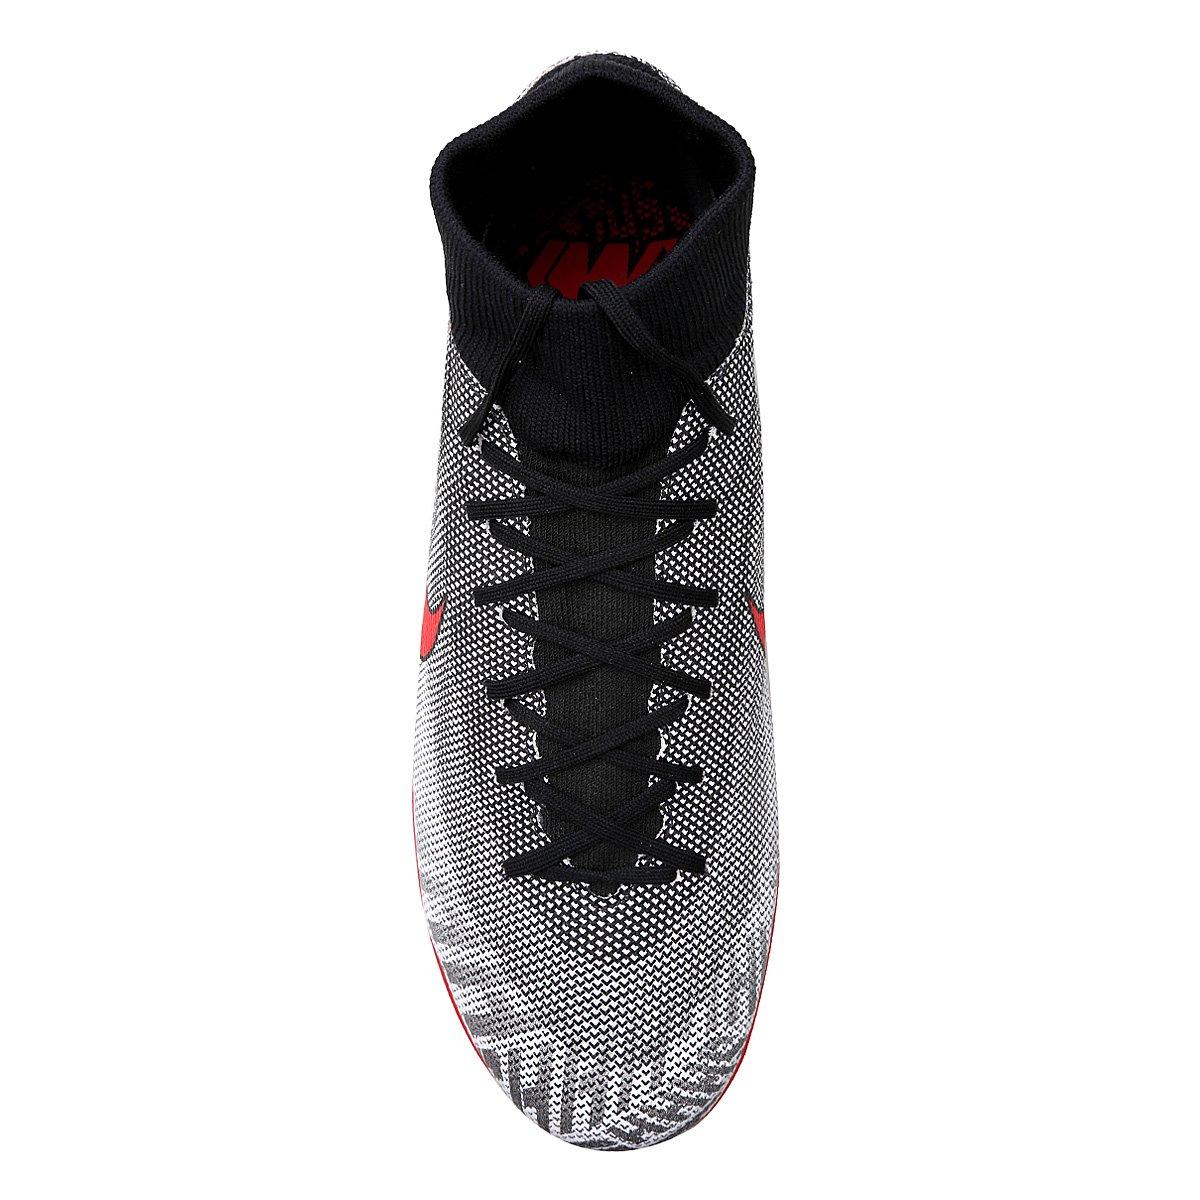 c6115ba312505 ... Chuteira Society Nike Mercurial Superfly 6 Academy Neymar Jr TF - Tam:  37 - 2 ...